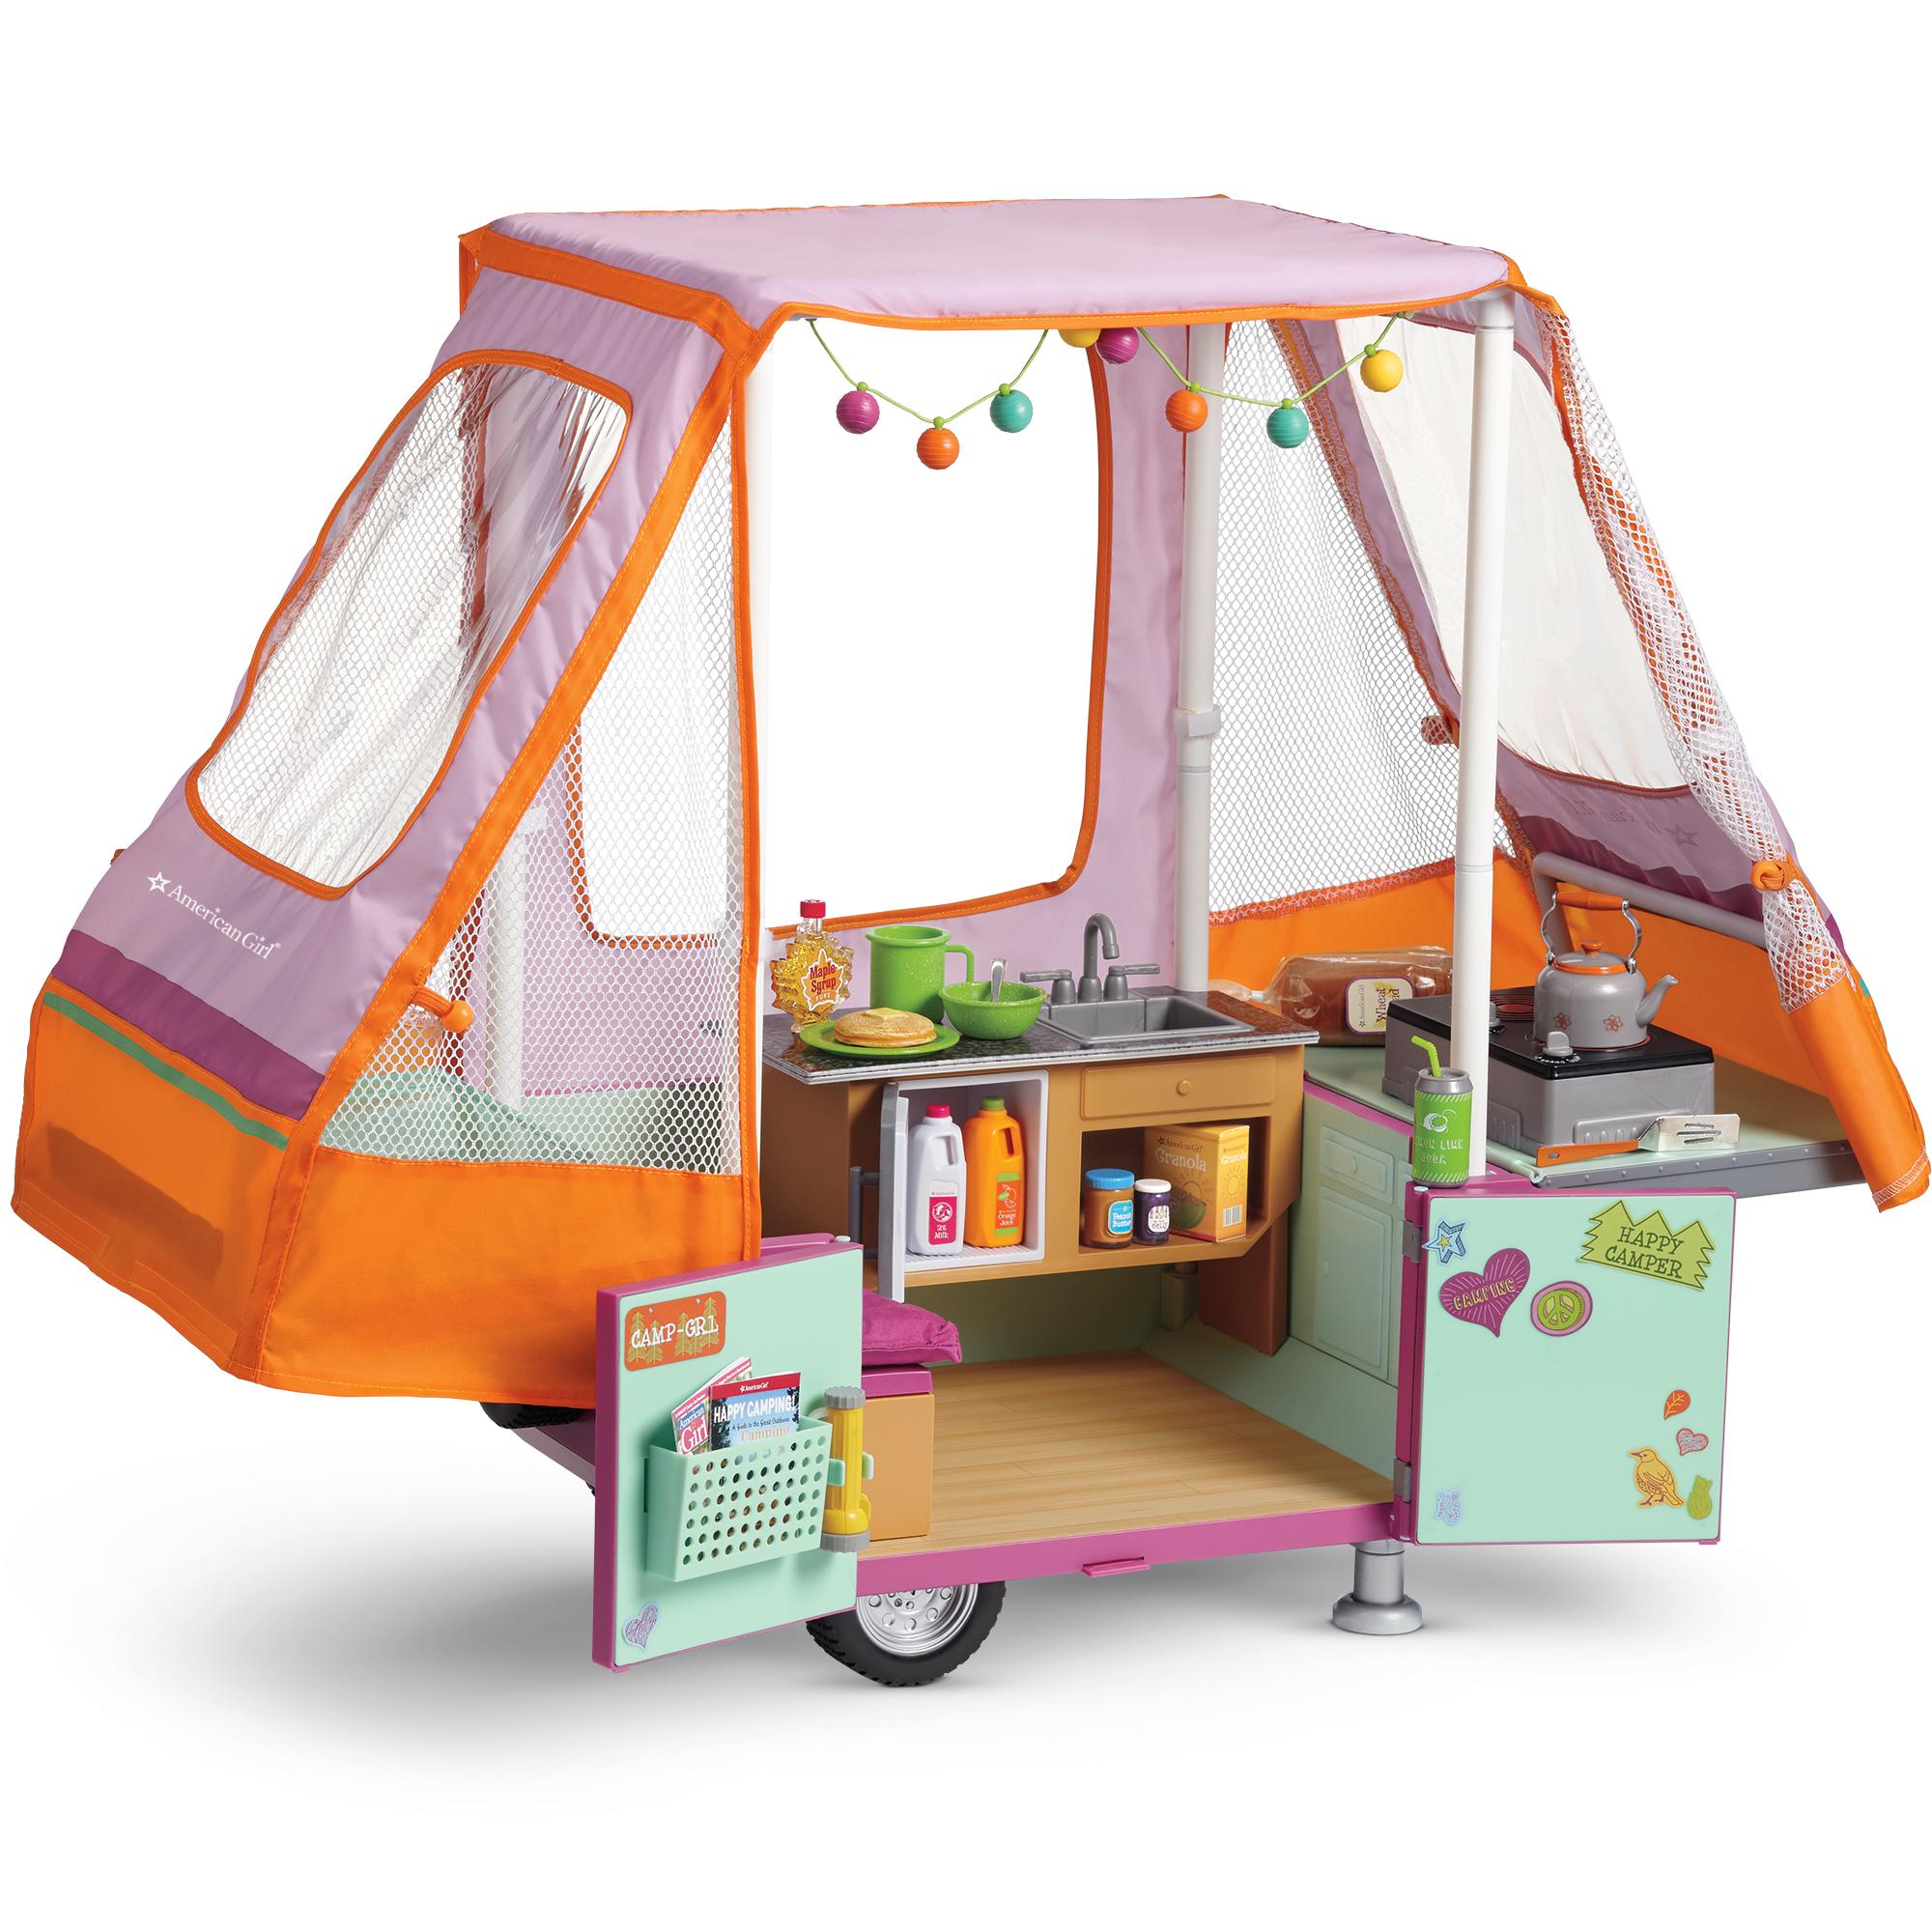 Adventure Pop-Up Camper